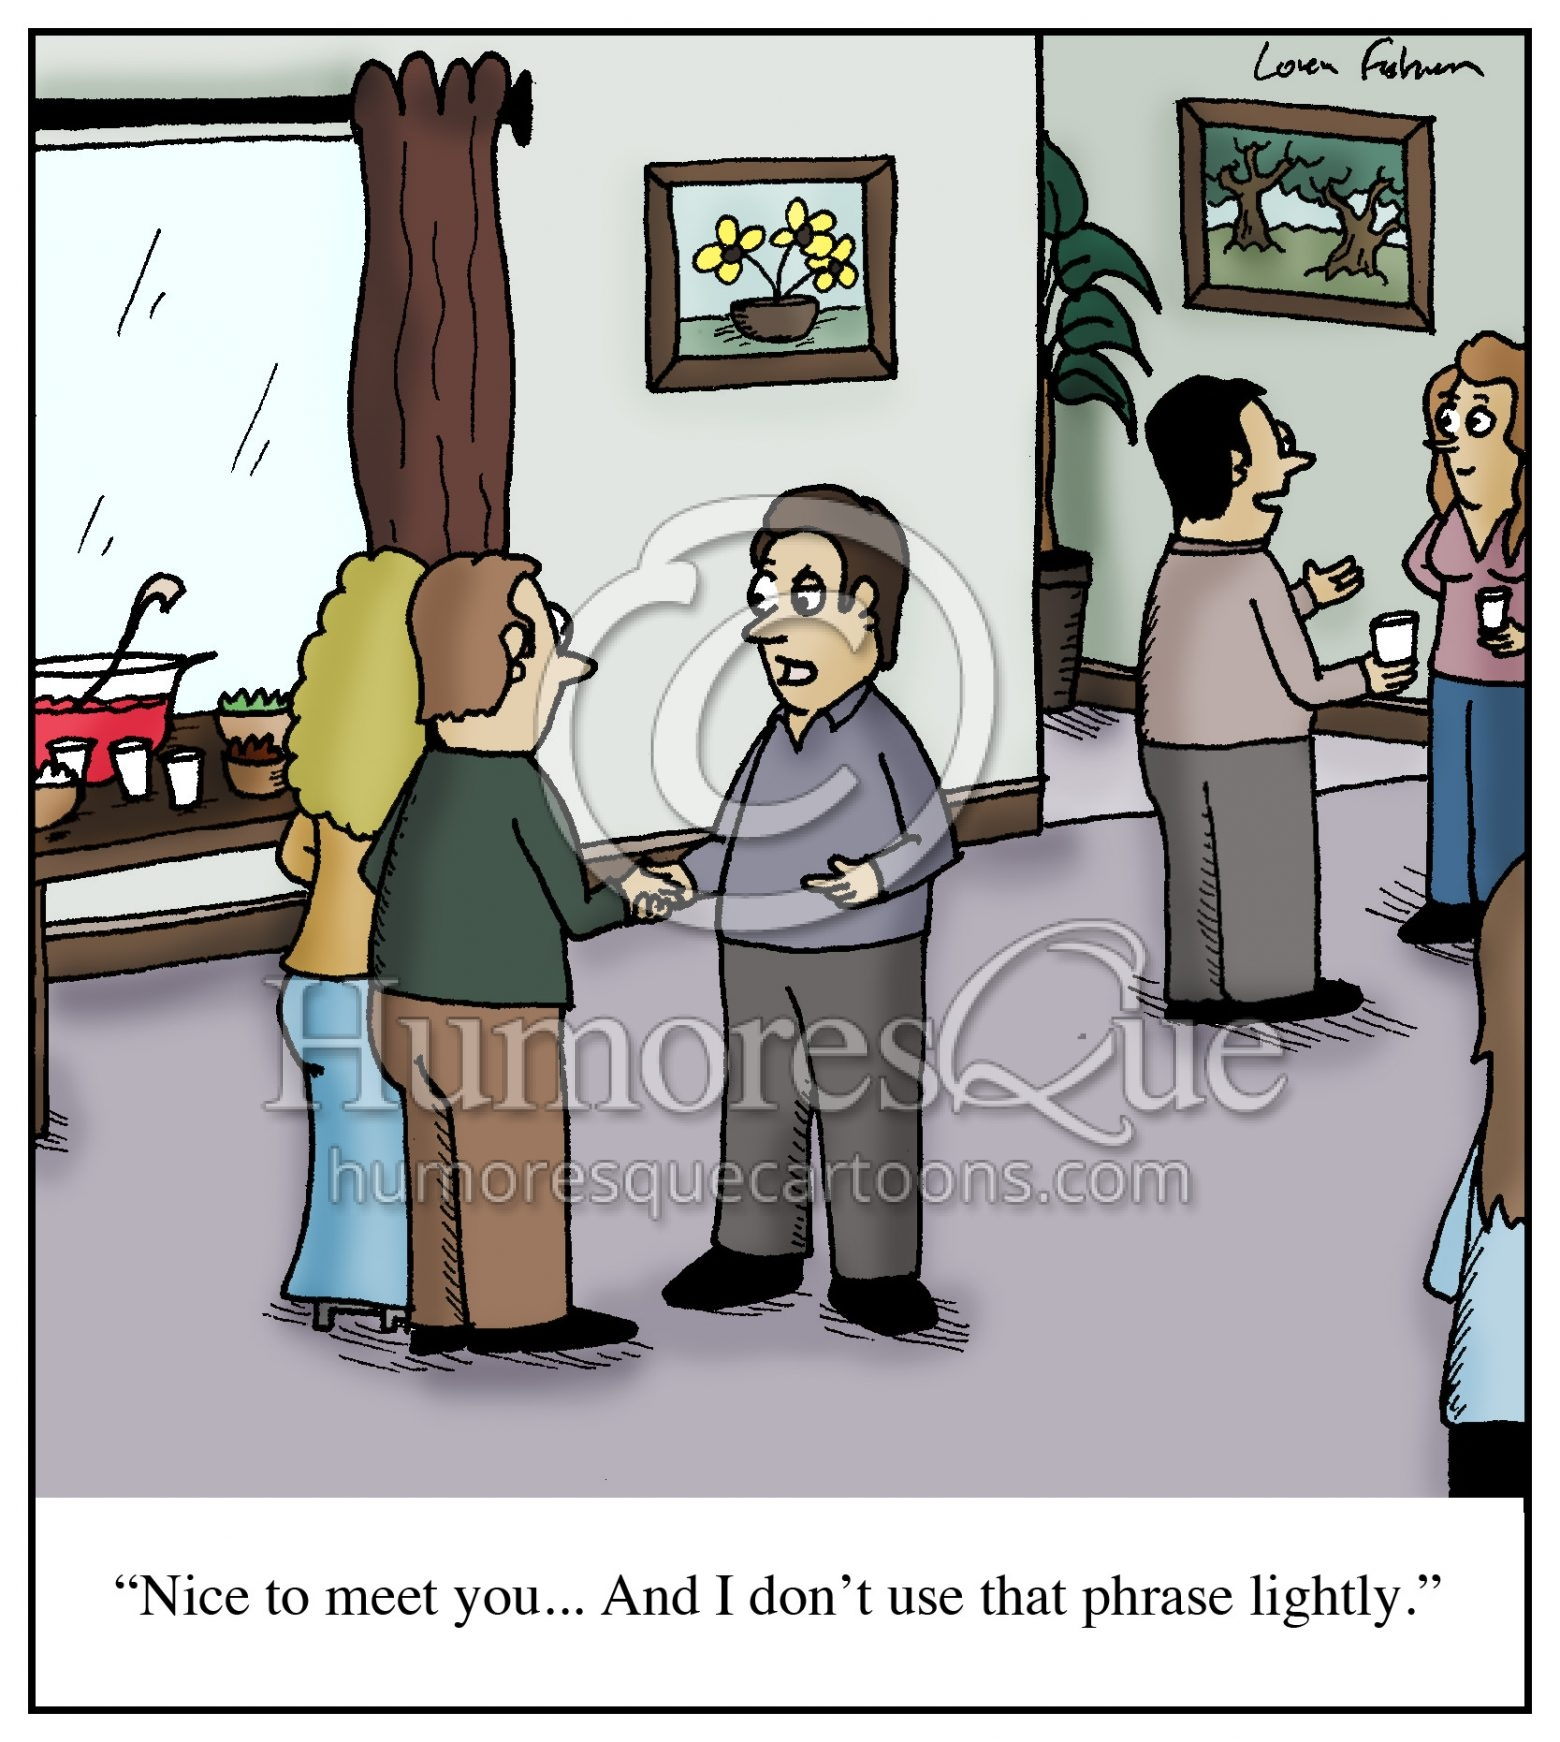 nice to meet you small talk cartoon